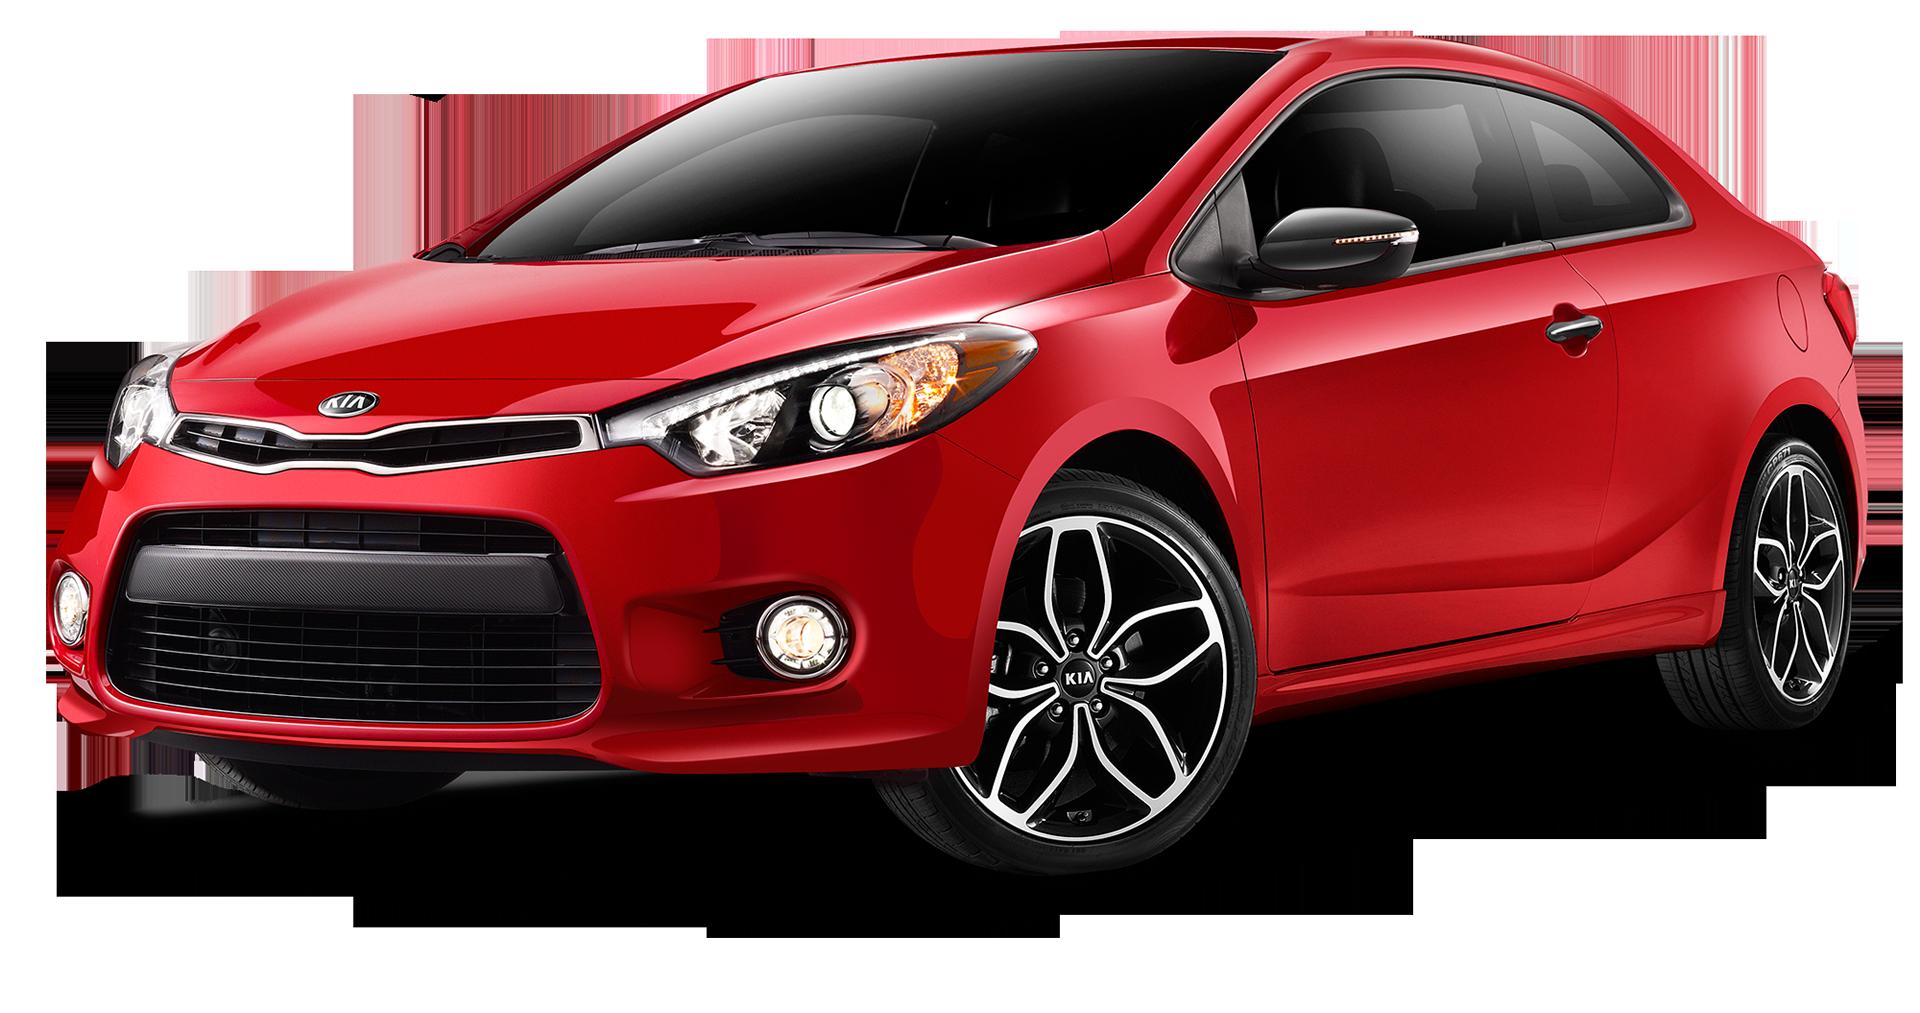 KIA cars PNG images free download, kia PNG.